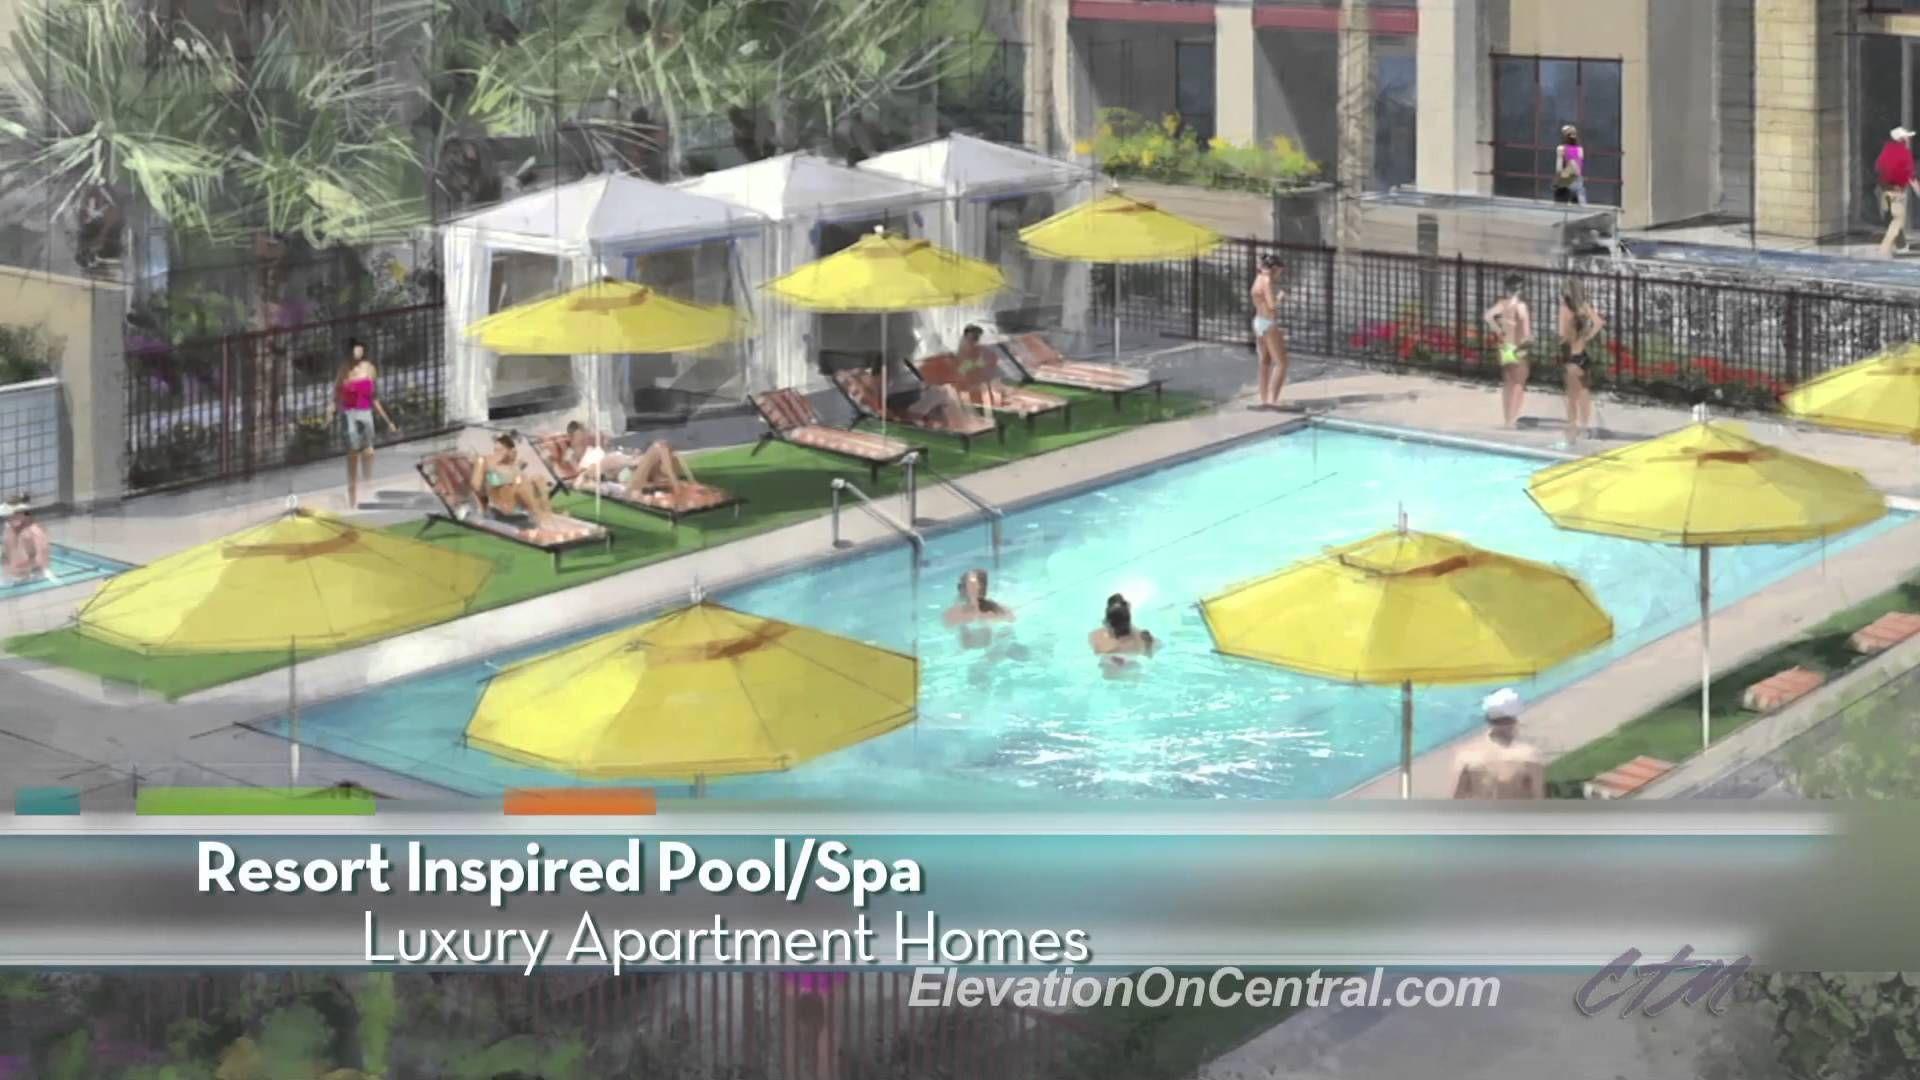 Elevation On Central Luxury Phoenix Az Apartments Greystar Spa Pool Luxury Spa Luxury Apartments